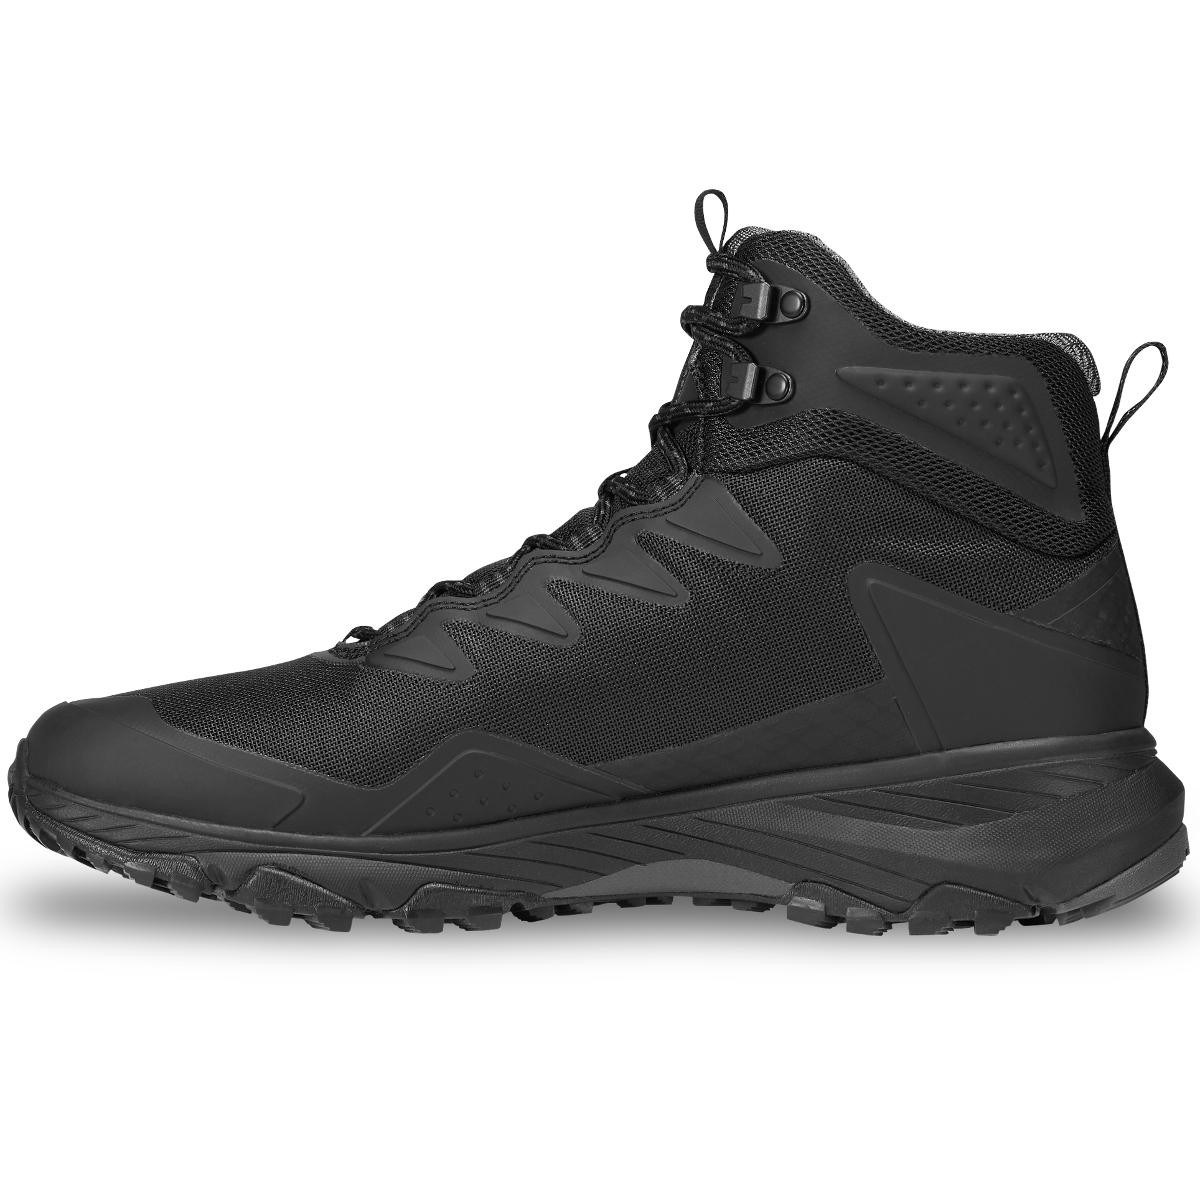 Ultra Fastpack III Mid GTX Hiking Boots